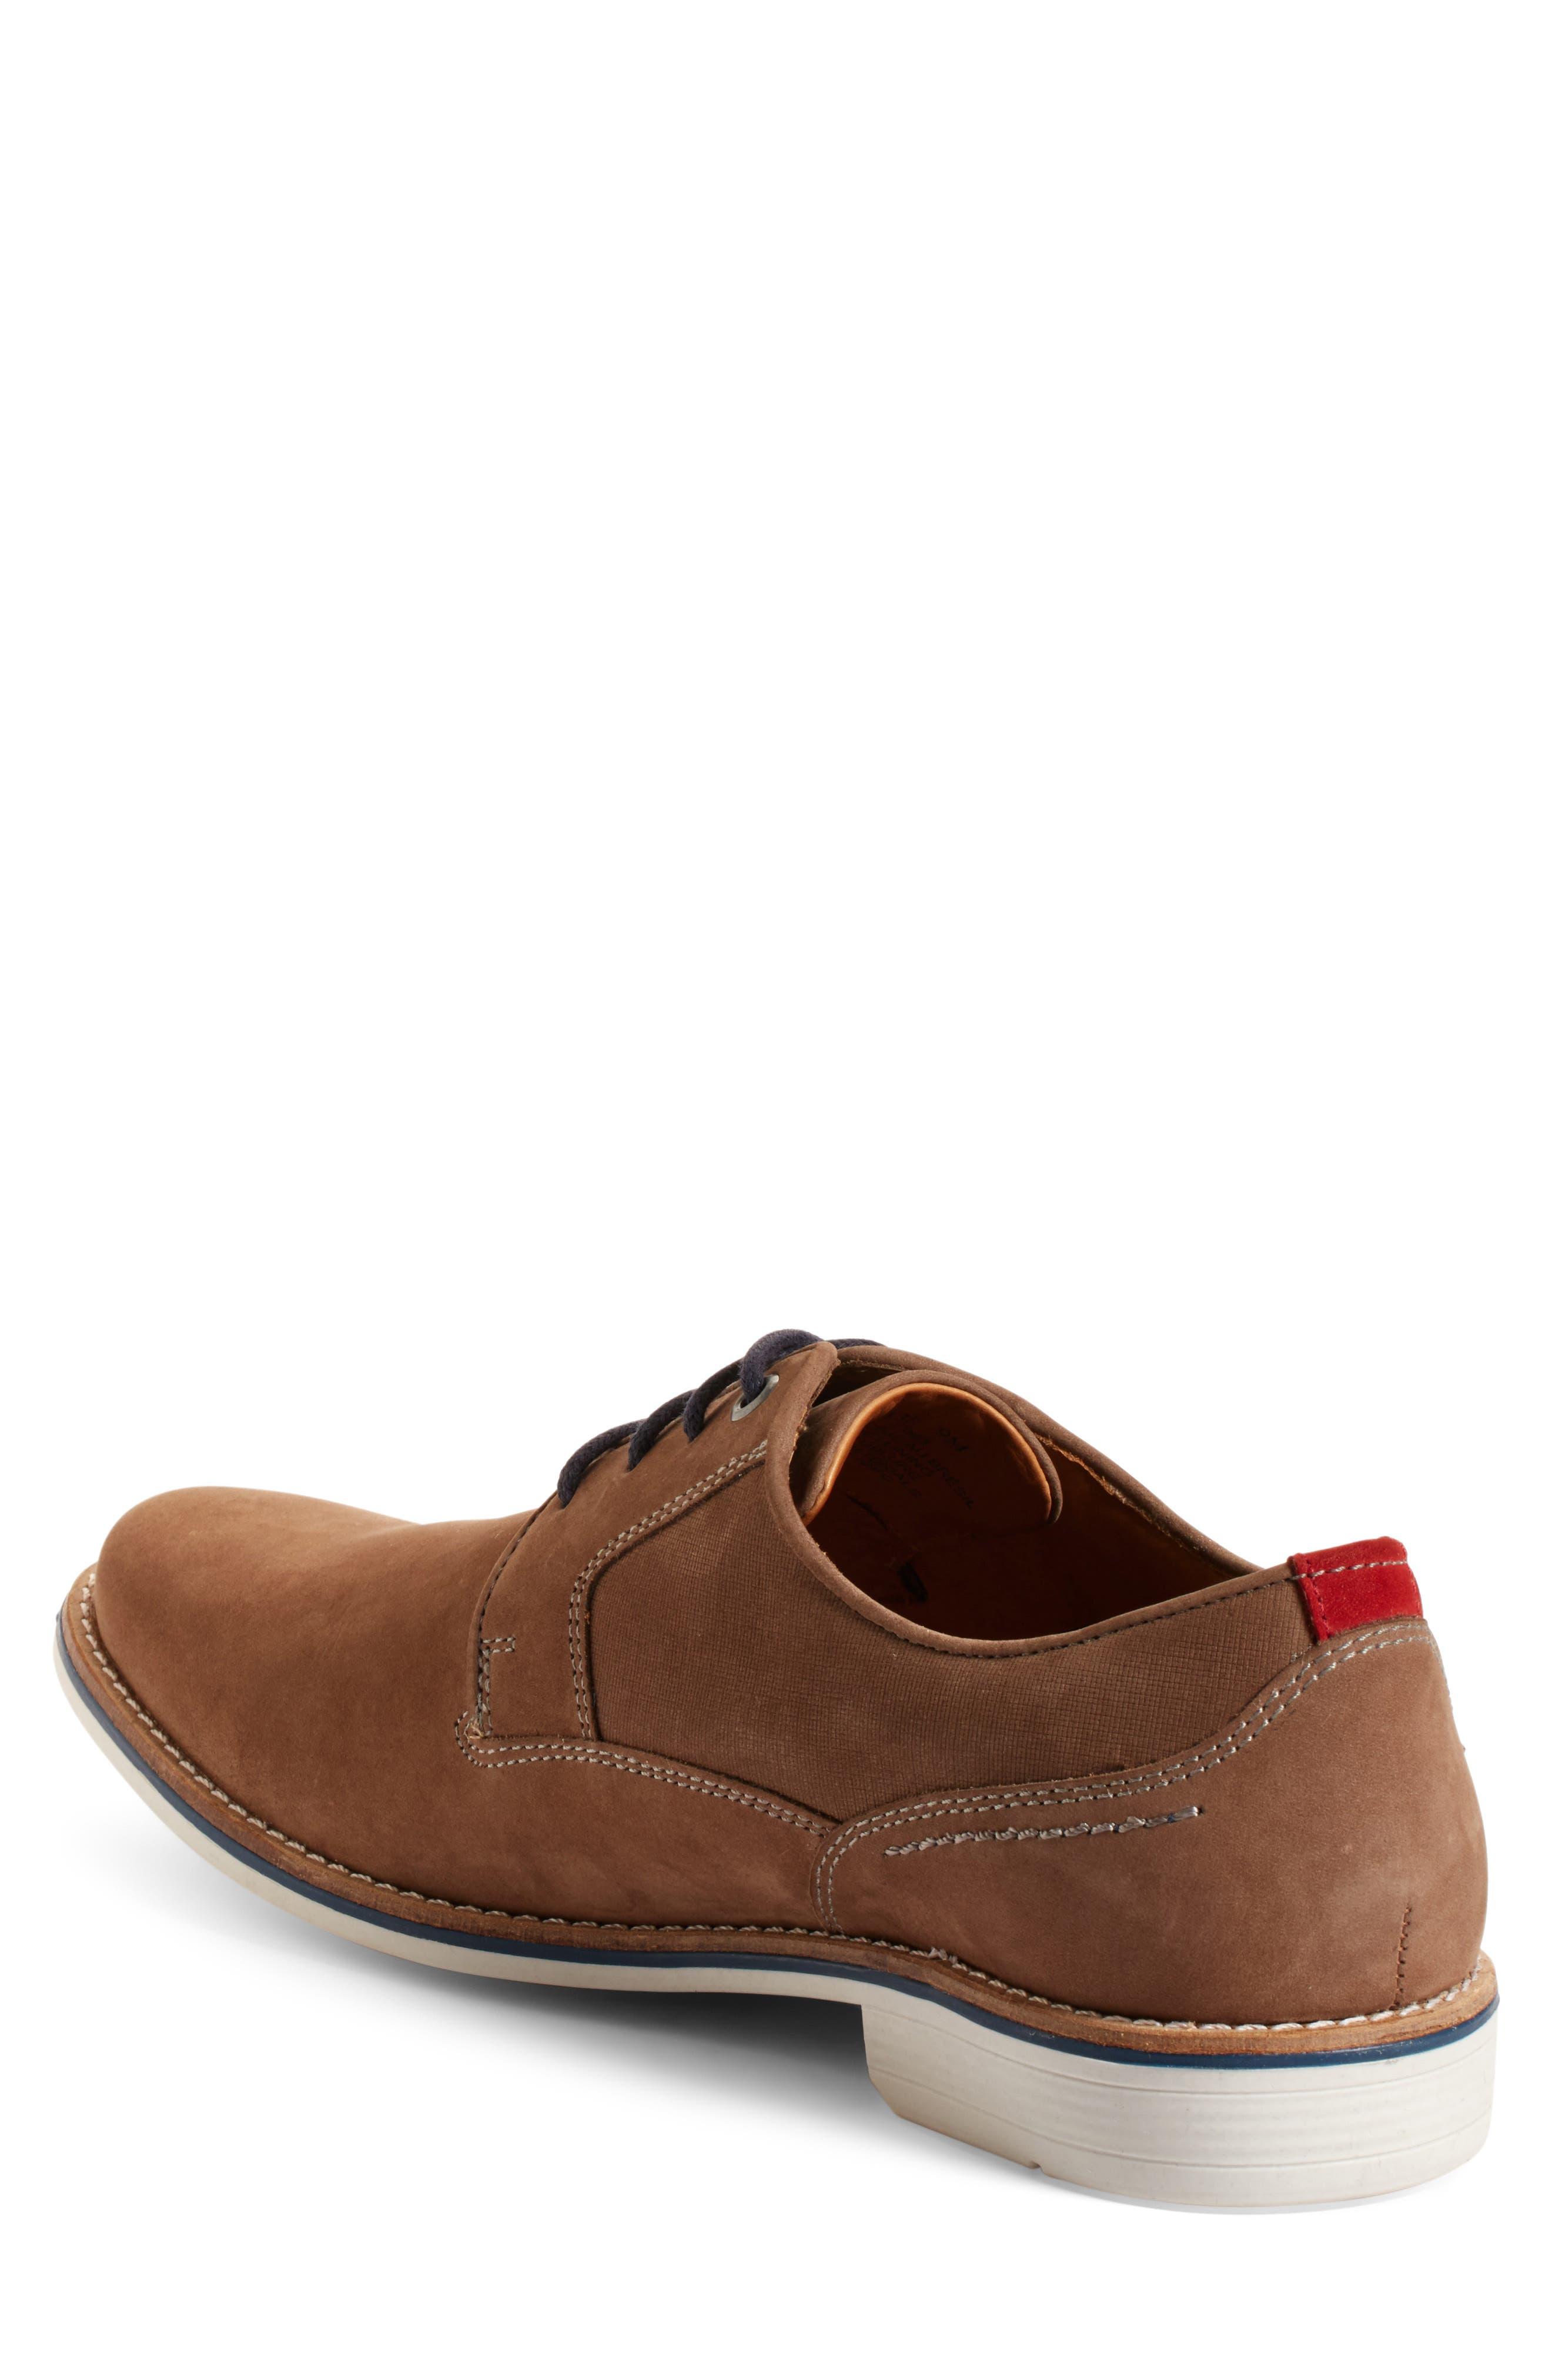 Alternate Image 2  - 1901 Archer Buck Shoe (Men)